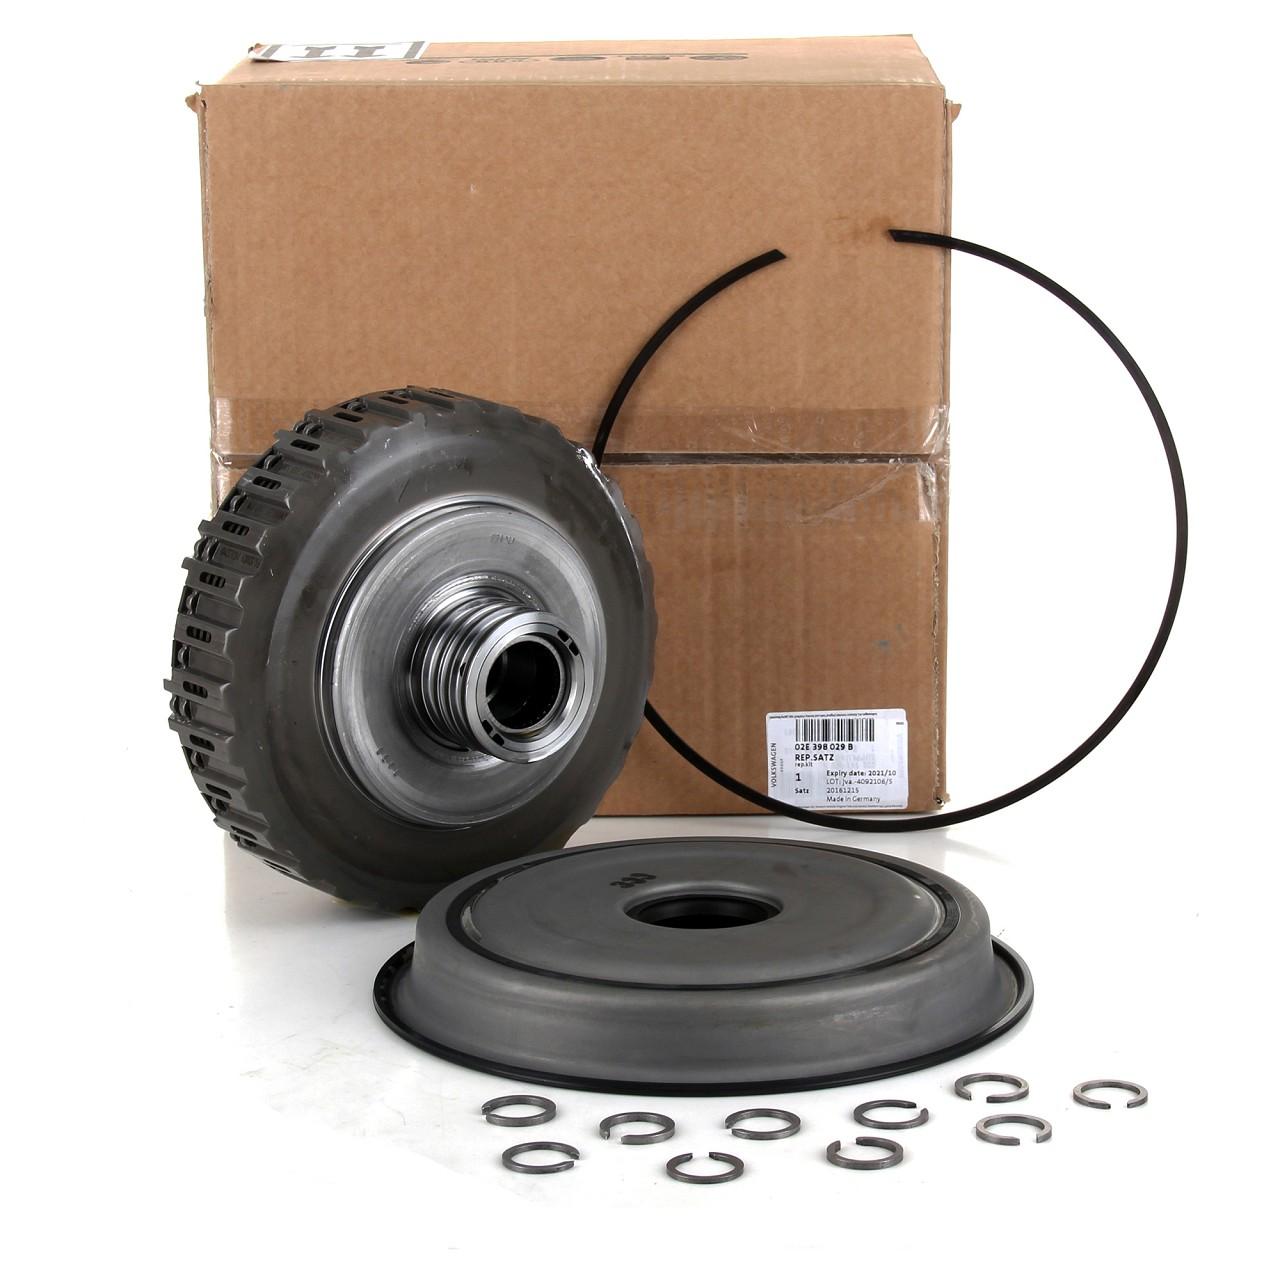 ORIGINAL Audi VW Kupplungssatz Reparatursatz für 6-Gang DSG Getriebe 02E398029B